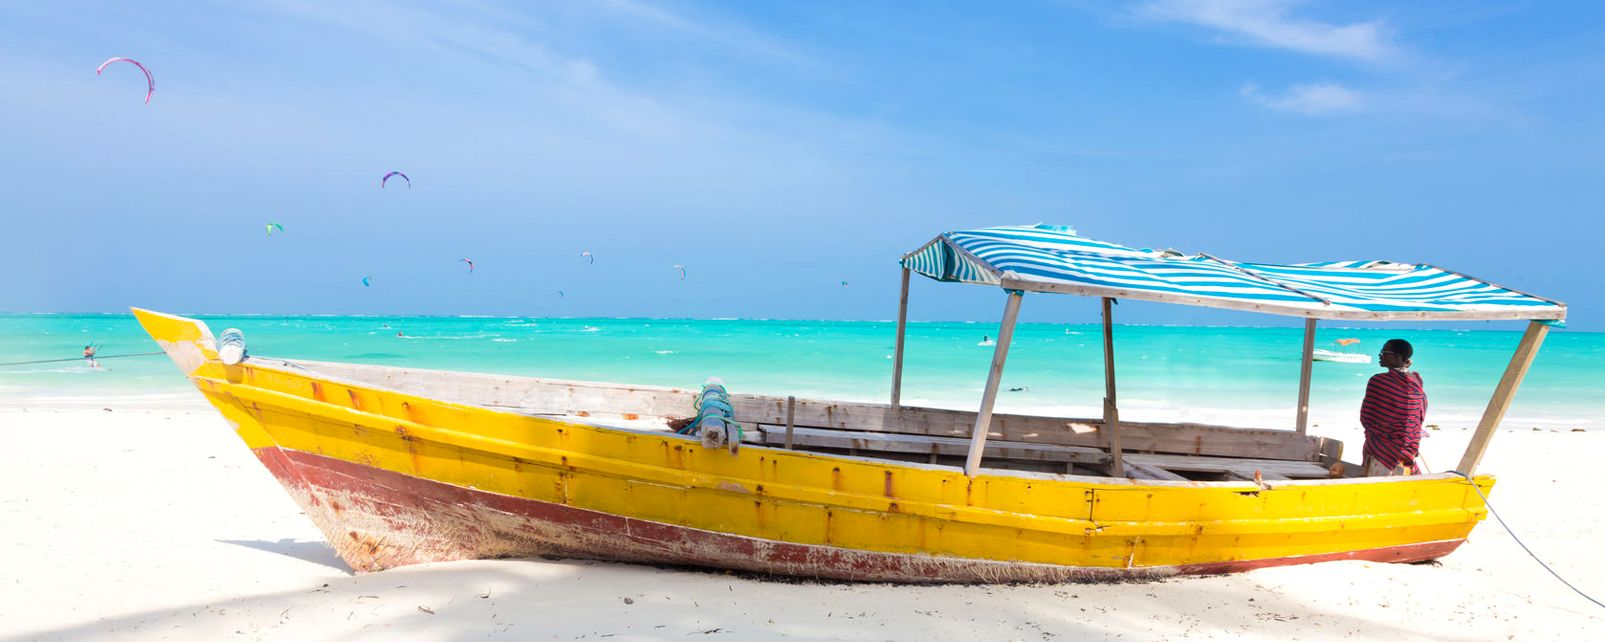 Dhow on Nungwi Beach, The north-west coast, Coasts, Zanzibar